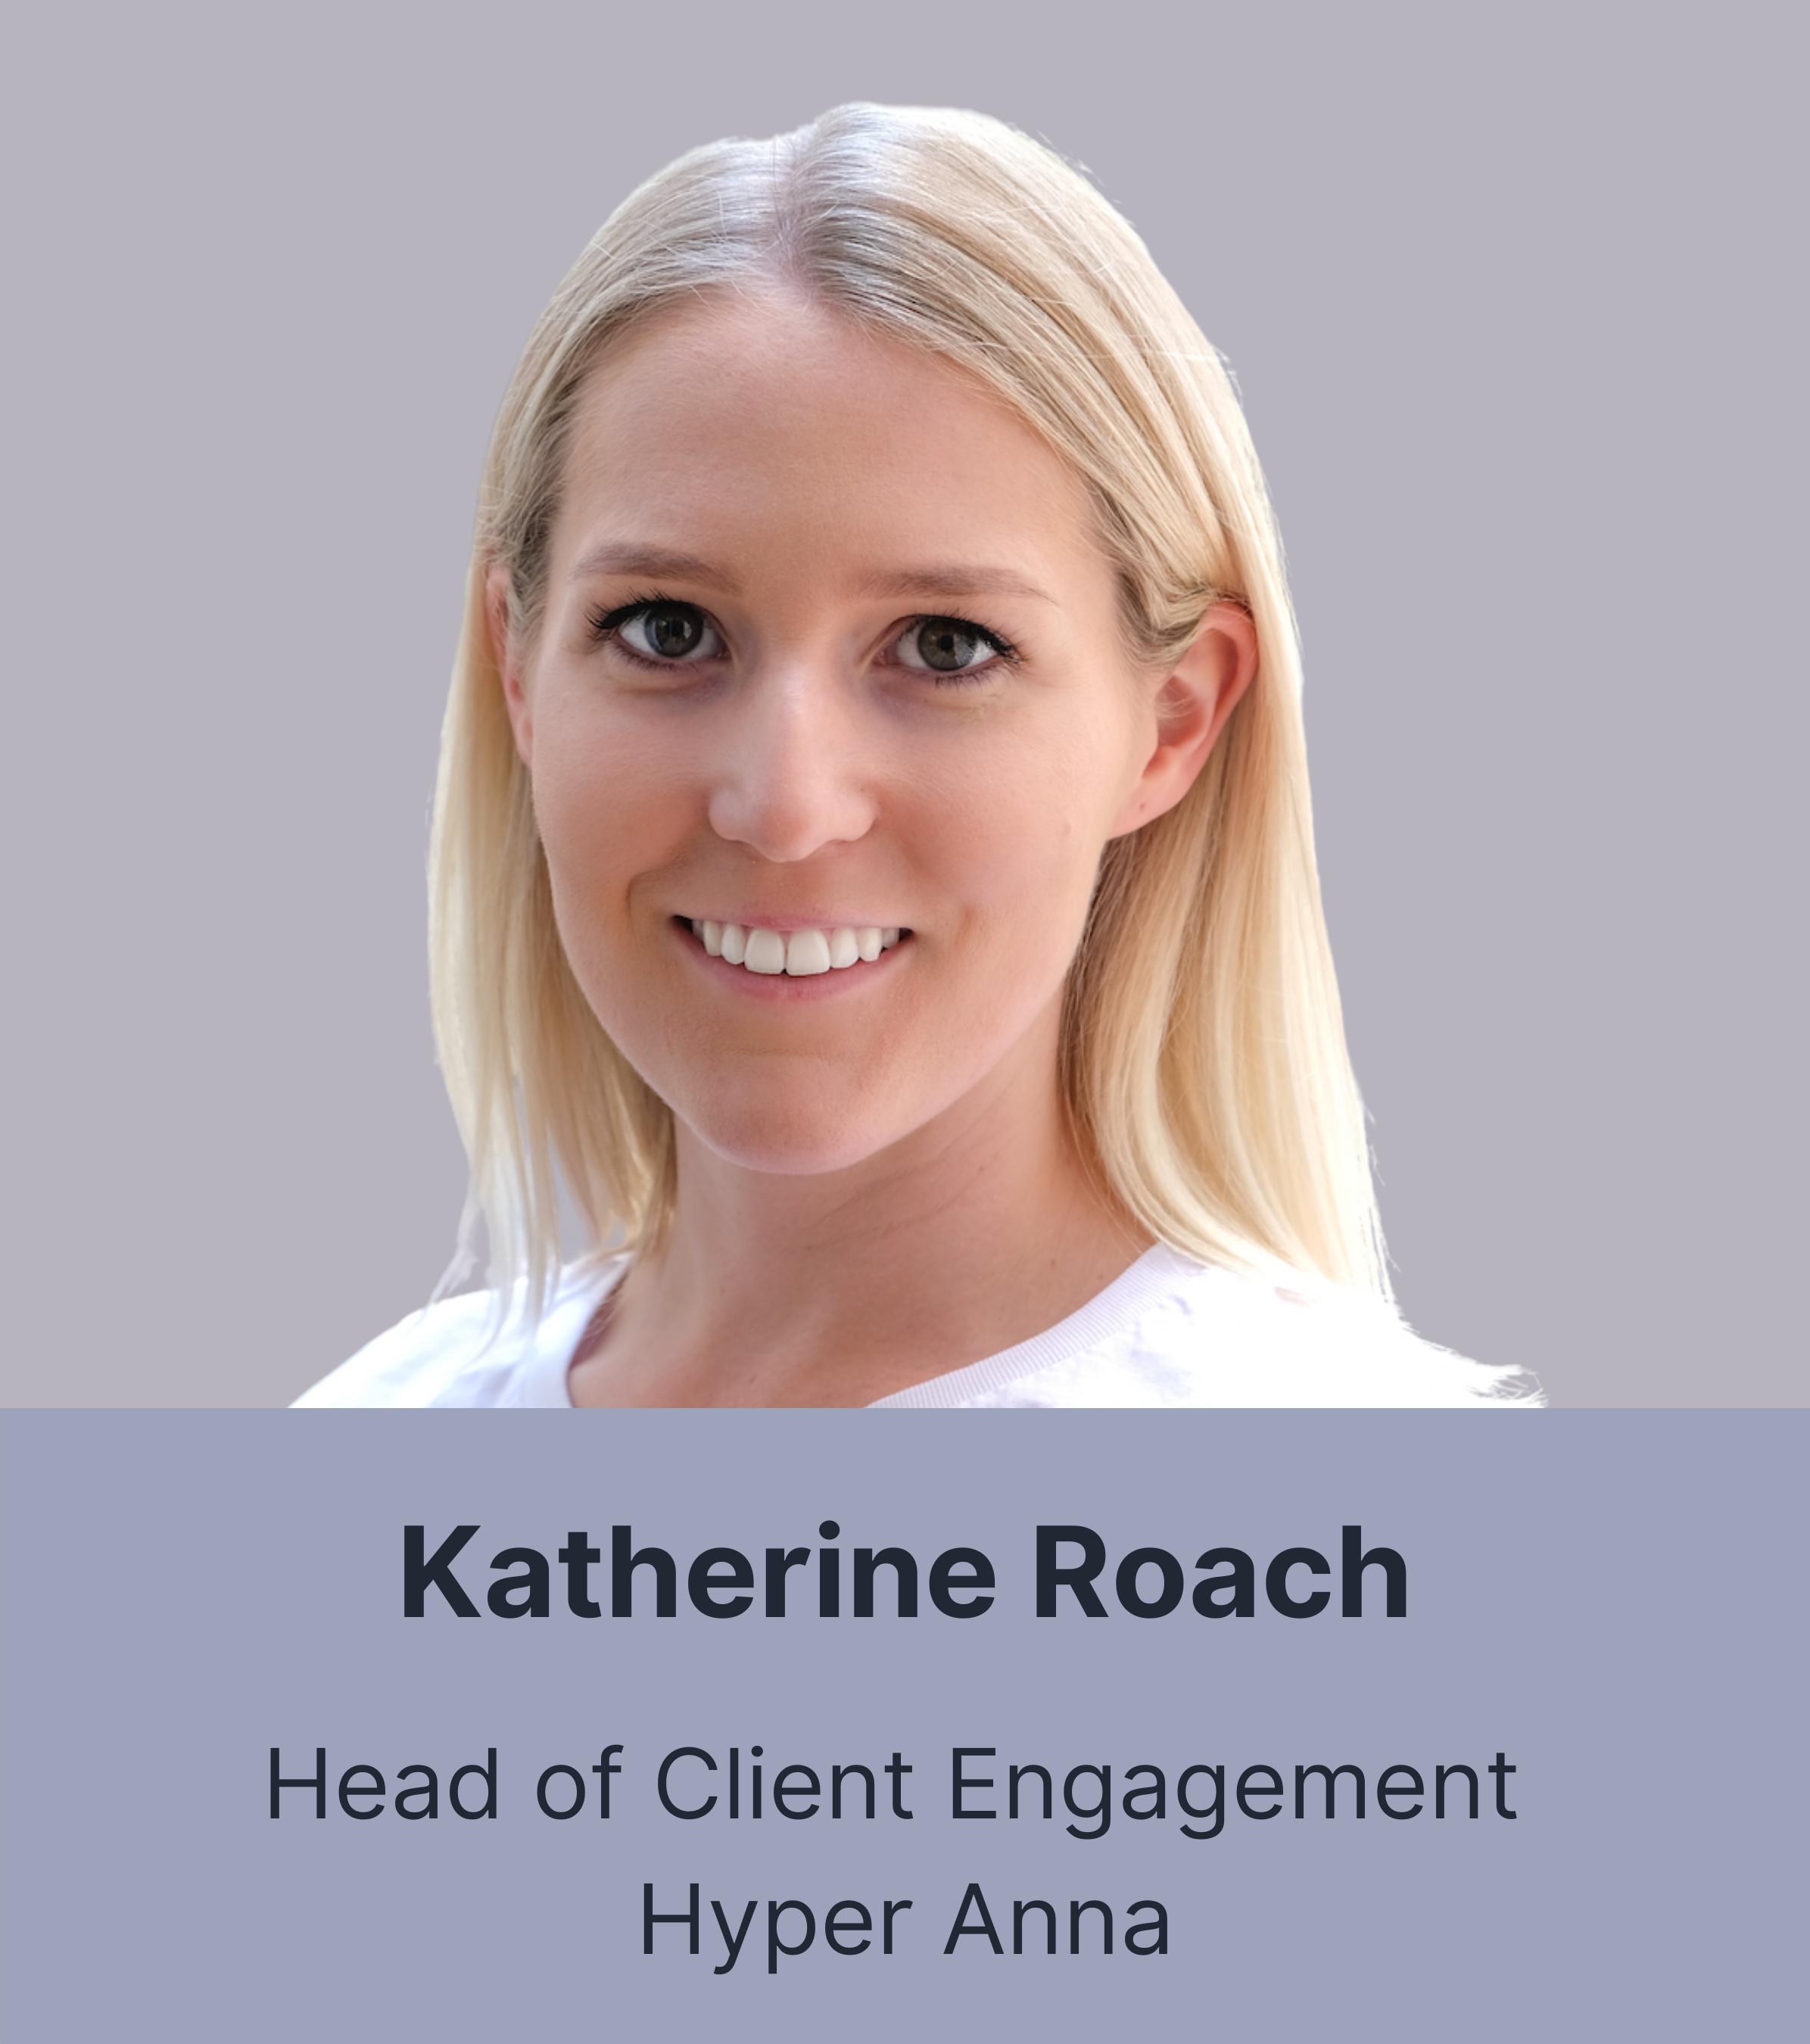 Katherine Roach - Head of Client Engagement, Hyper Anna